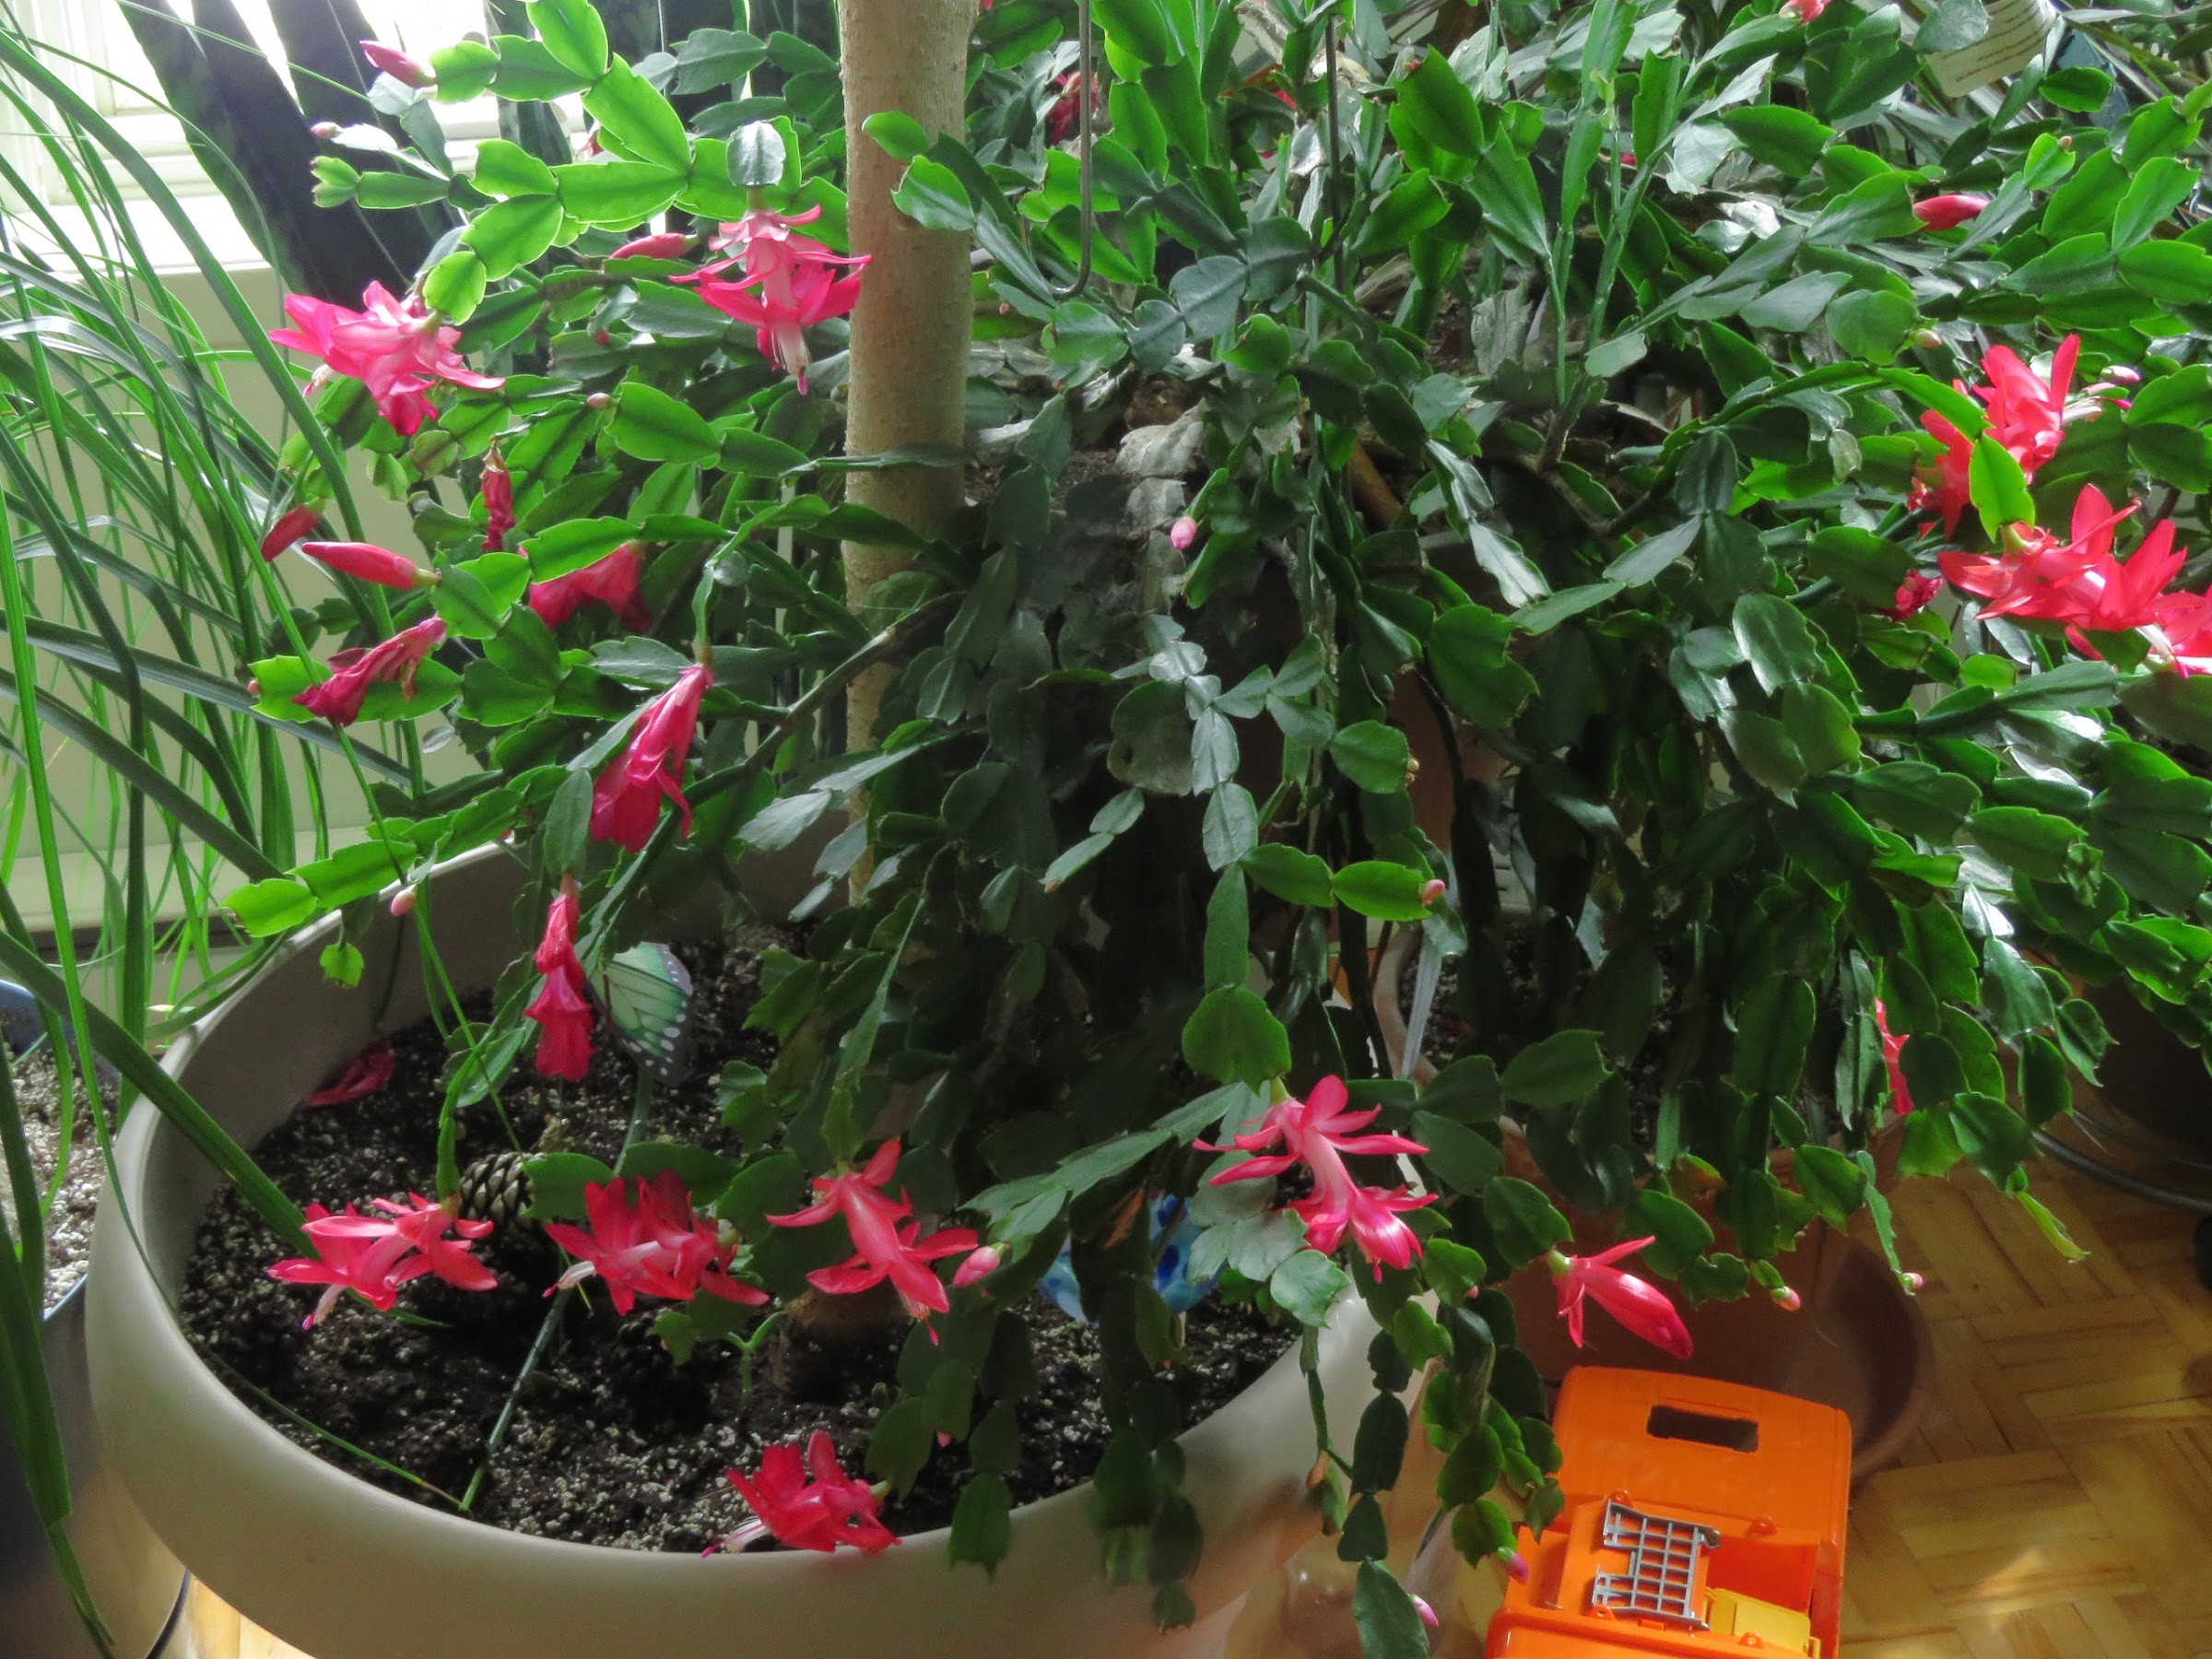 Mes petites plantes grasses et cactées - Page 4 Fne4hKYWHA4s_Lpt4nkb58T40umrnDR2Xjo1iR07r8xy5eaLKAYcNO1l6L5WZrTc92Fr2dTEY3yhVrG1uSGRV7gkMWxIwJ8GShH2HQmyDIL2aEX_zssRrvi43s_xvnDbk_JAM7-XyHI=w2400